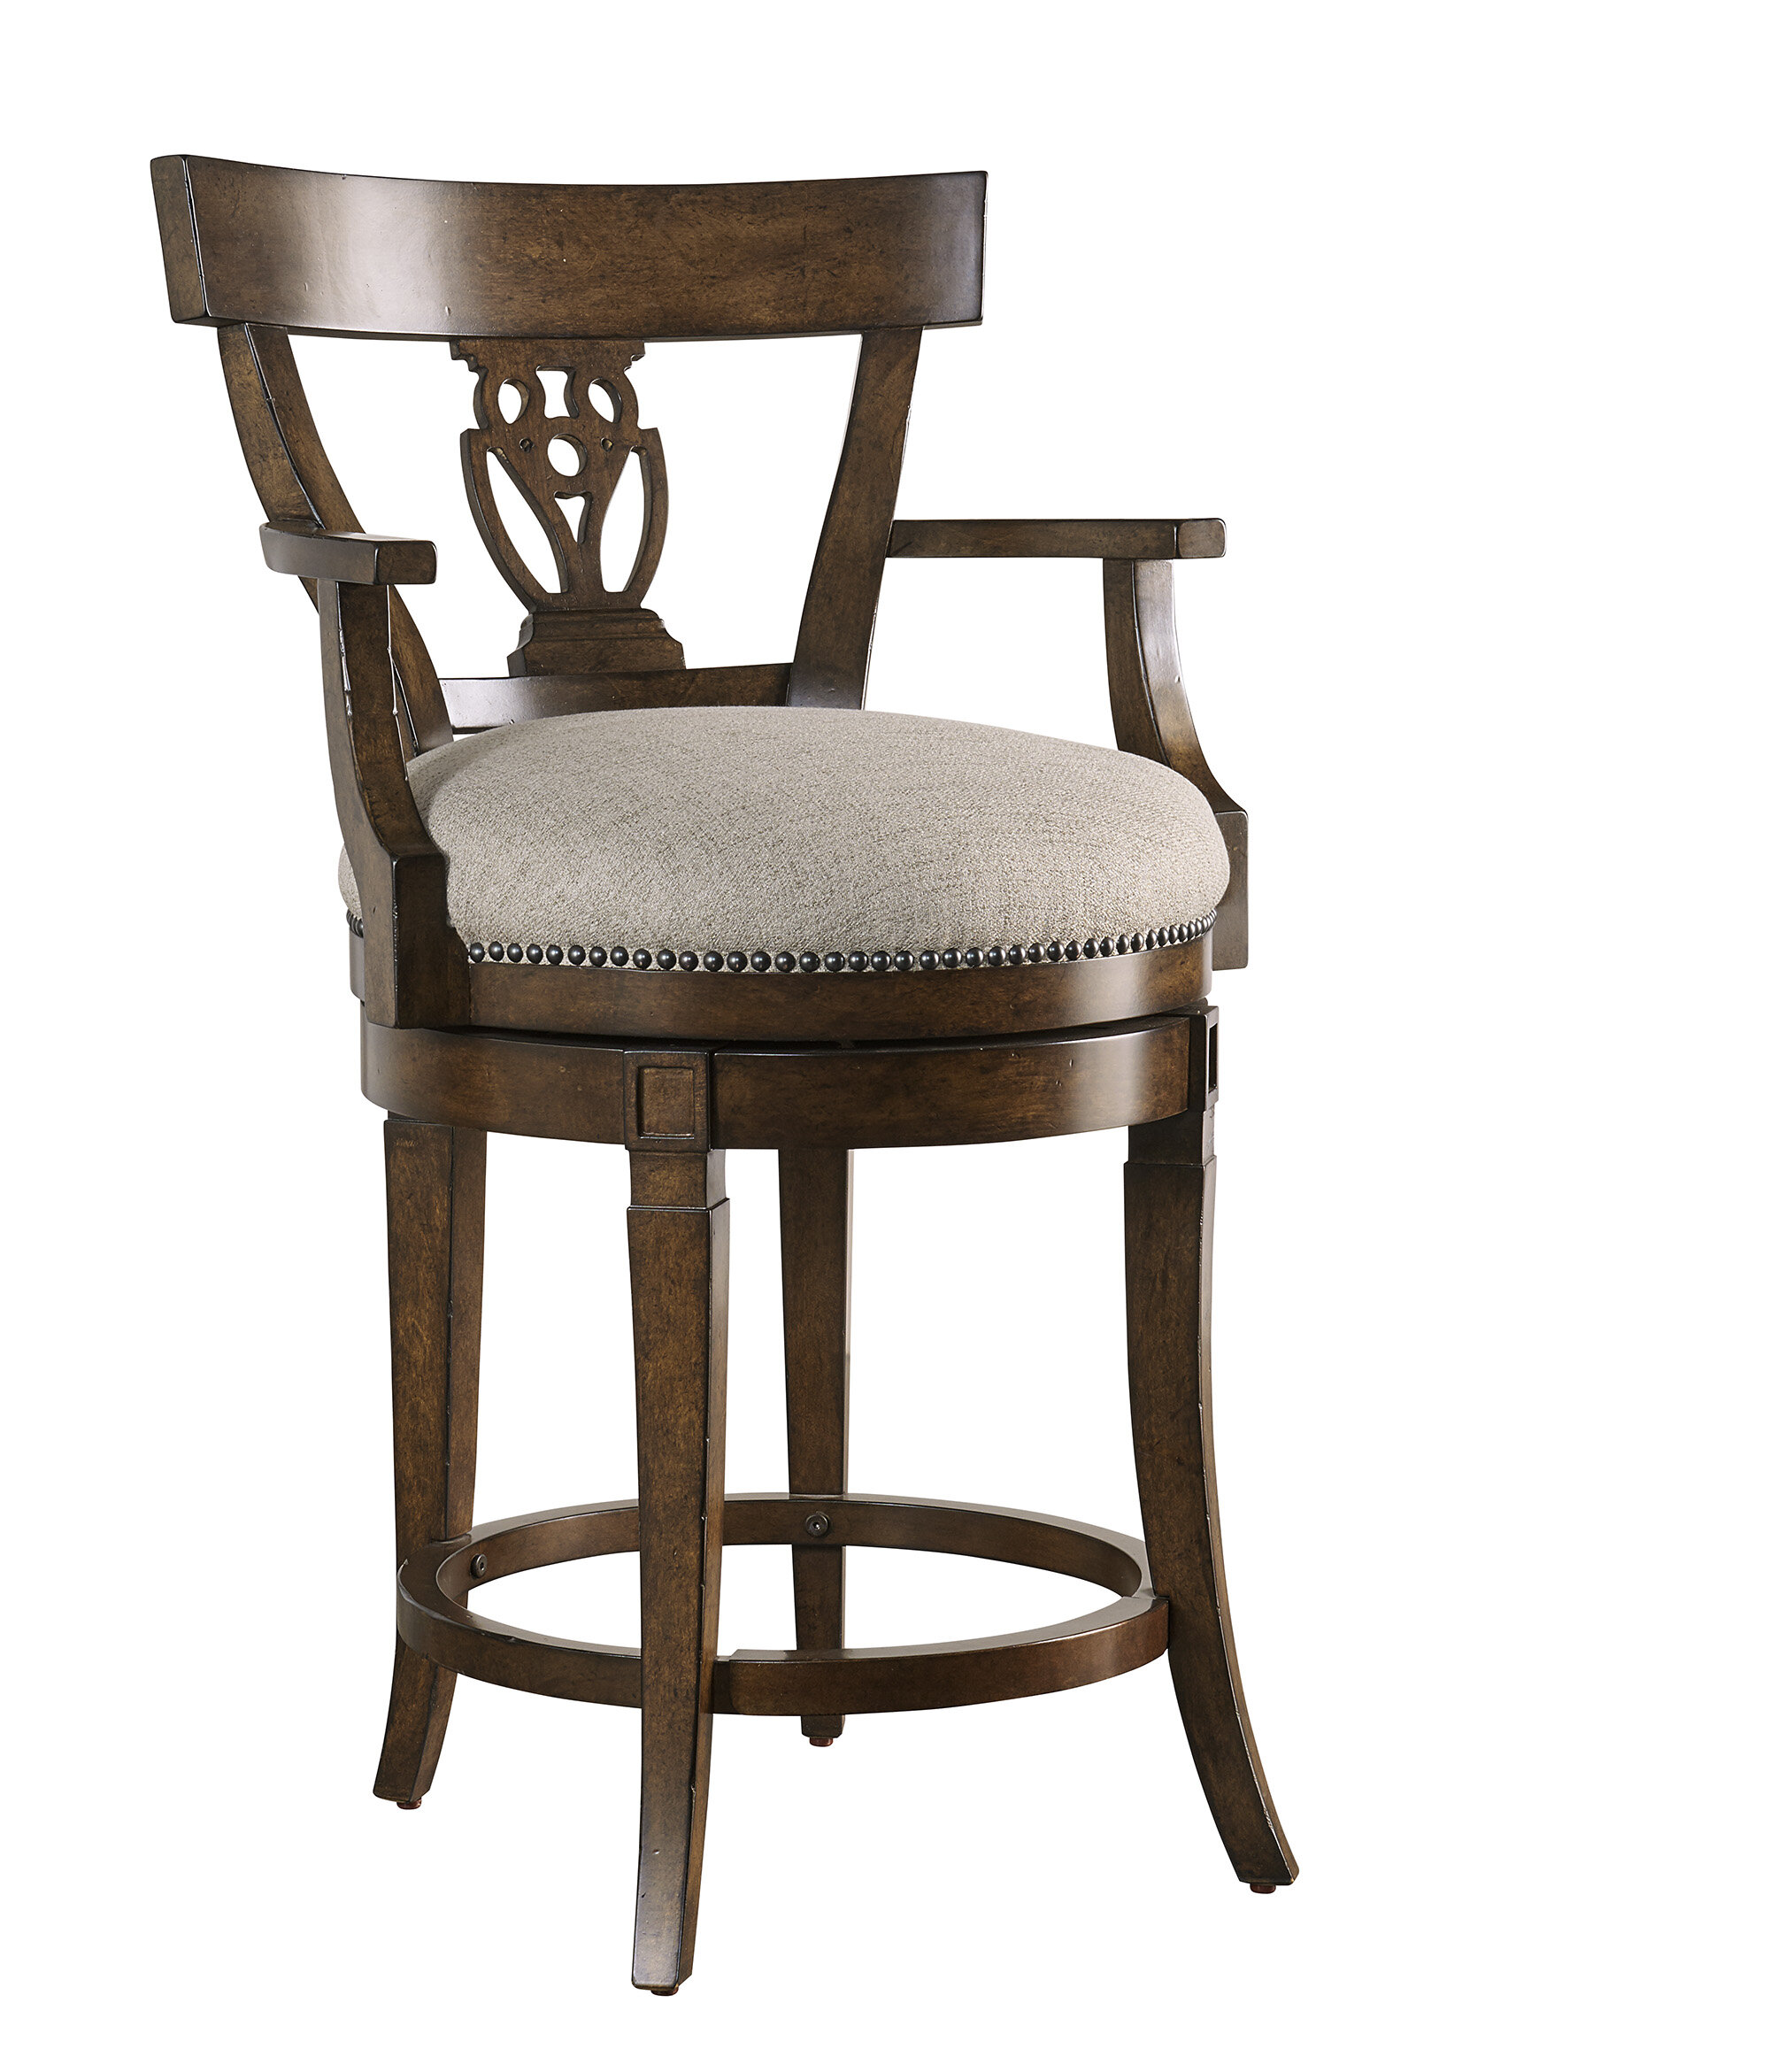 Miraculous Marionville 25 Swivel Bar Stool Lamtechconsult Wood Chair Design Ideas Lamtechconsultcom